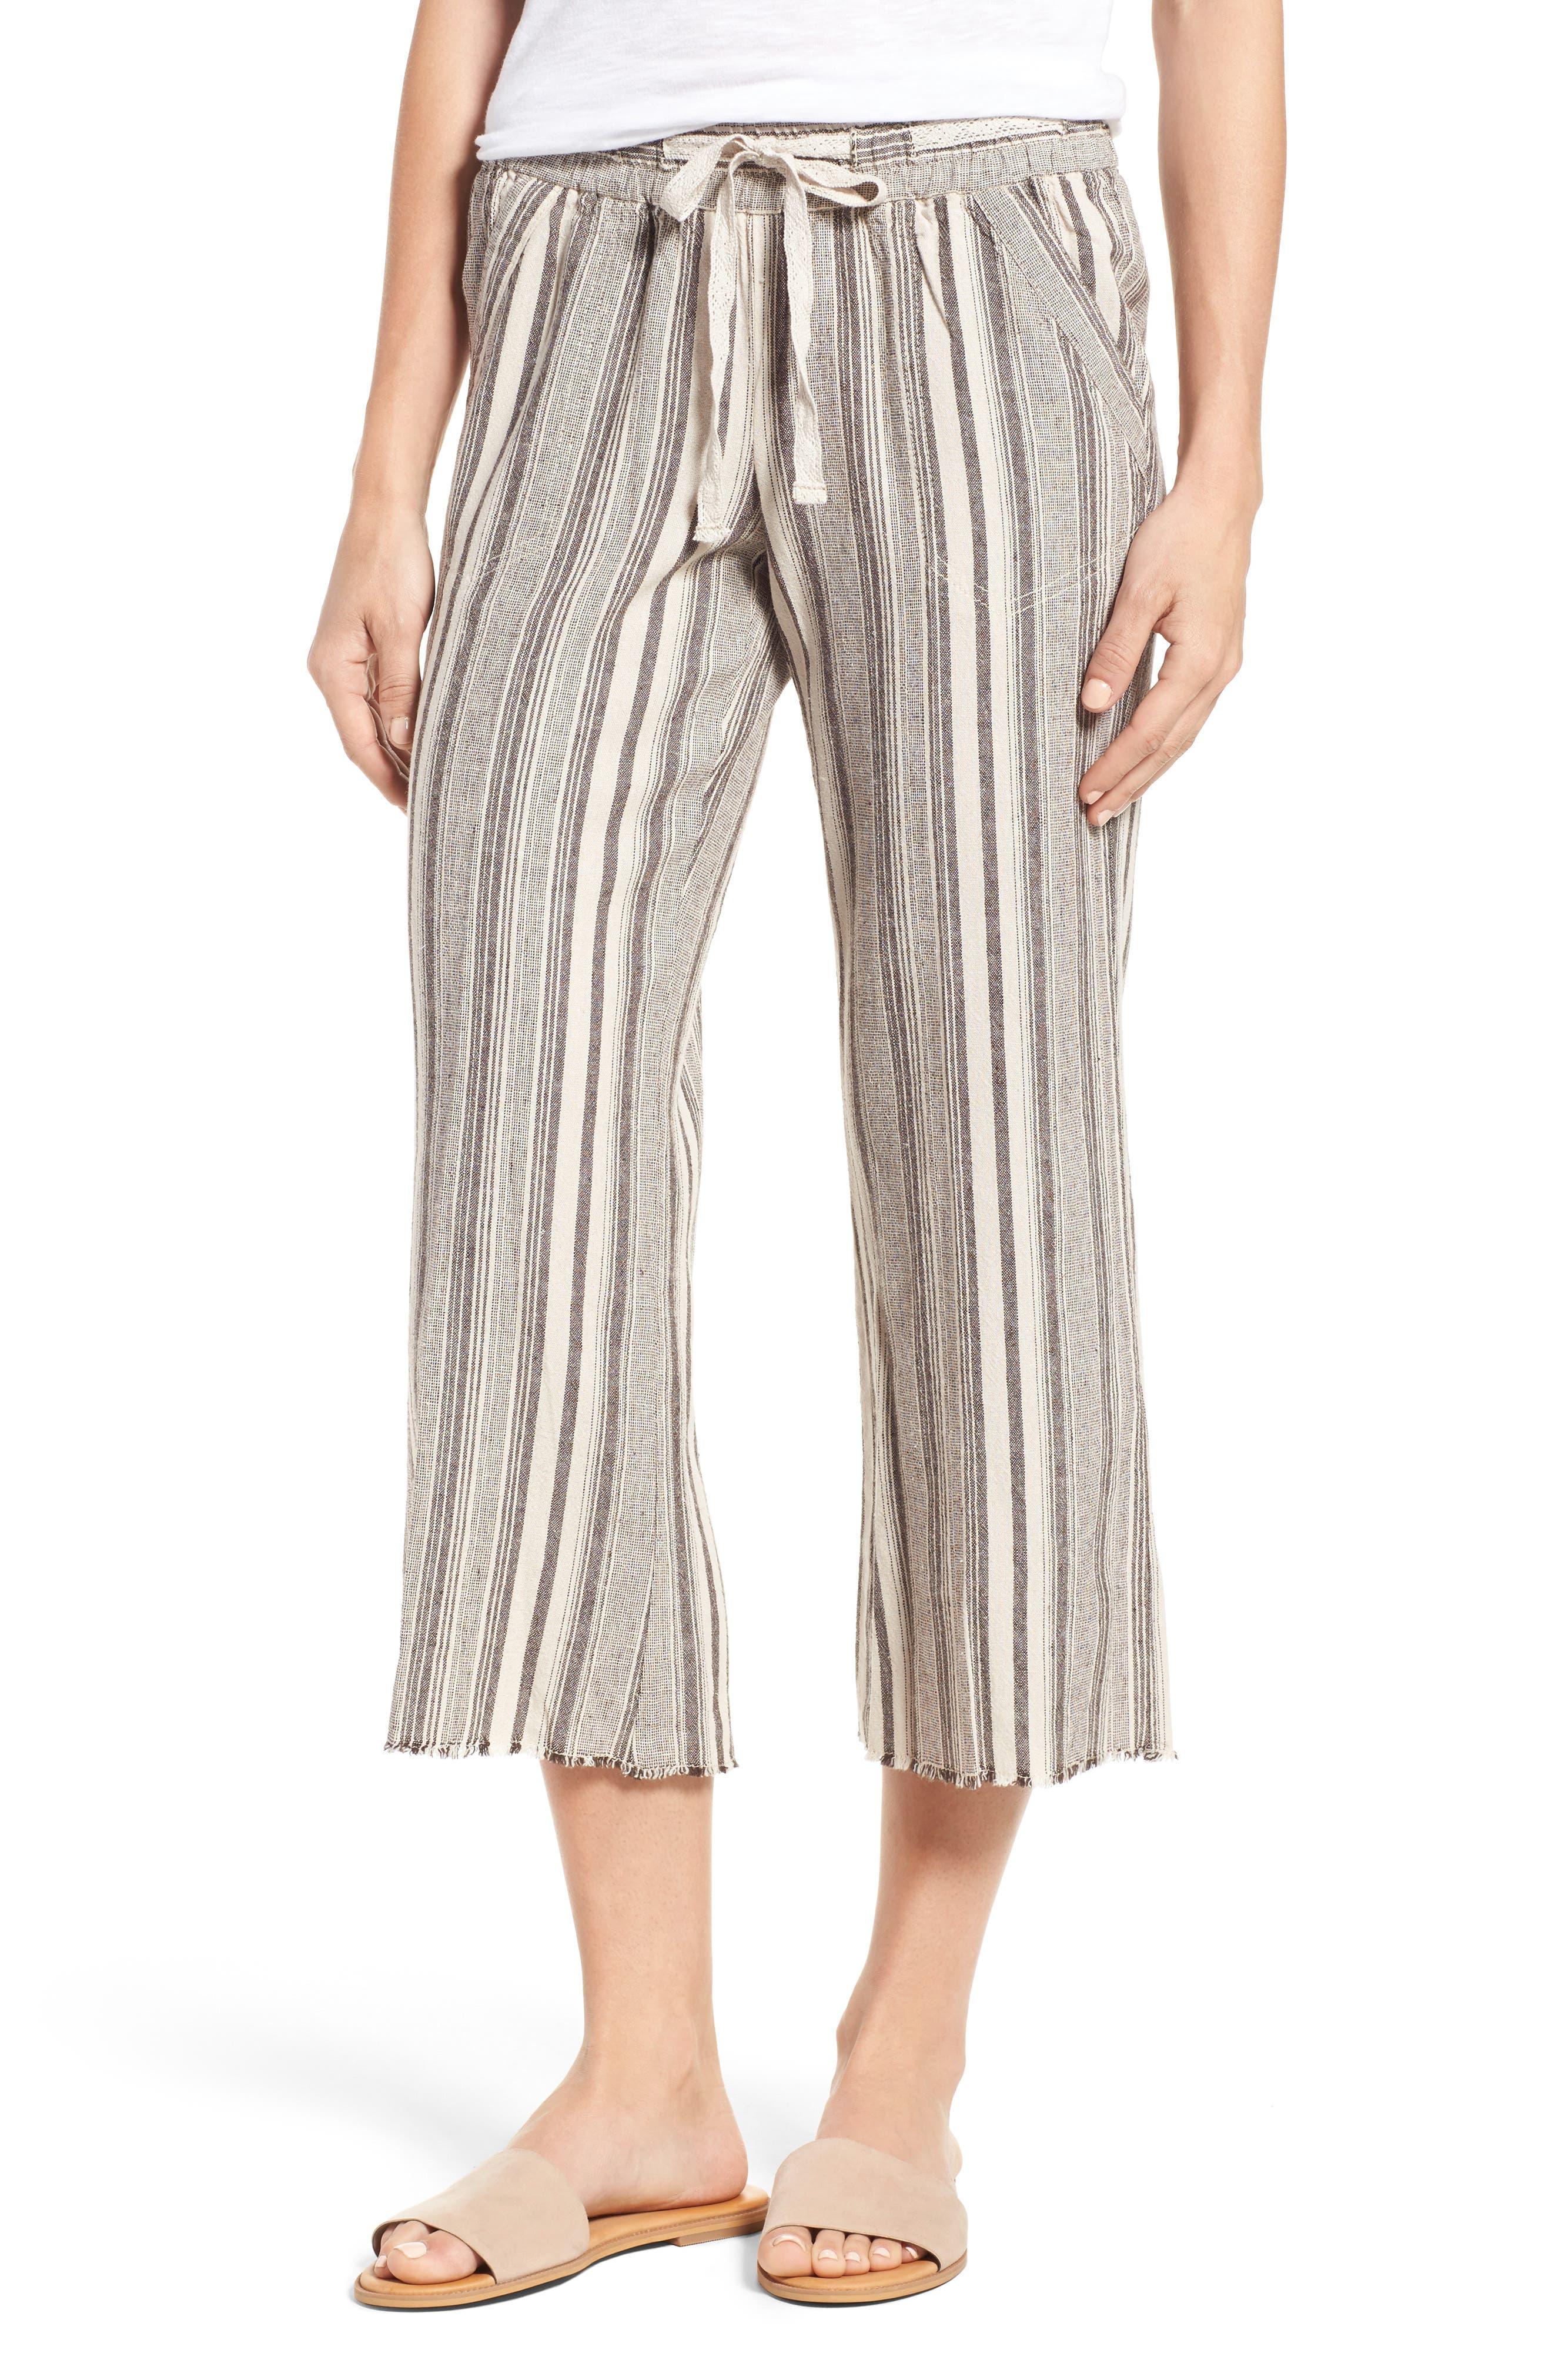 Wit & Wisdom Drawstring Stripe Crop Sailor Pants (Nordstrom Exclusive) (Regular & Petite)